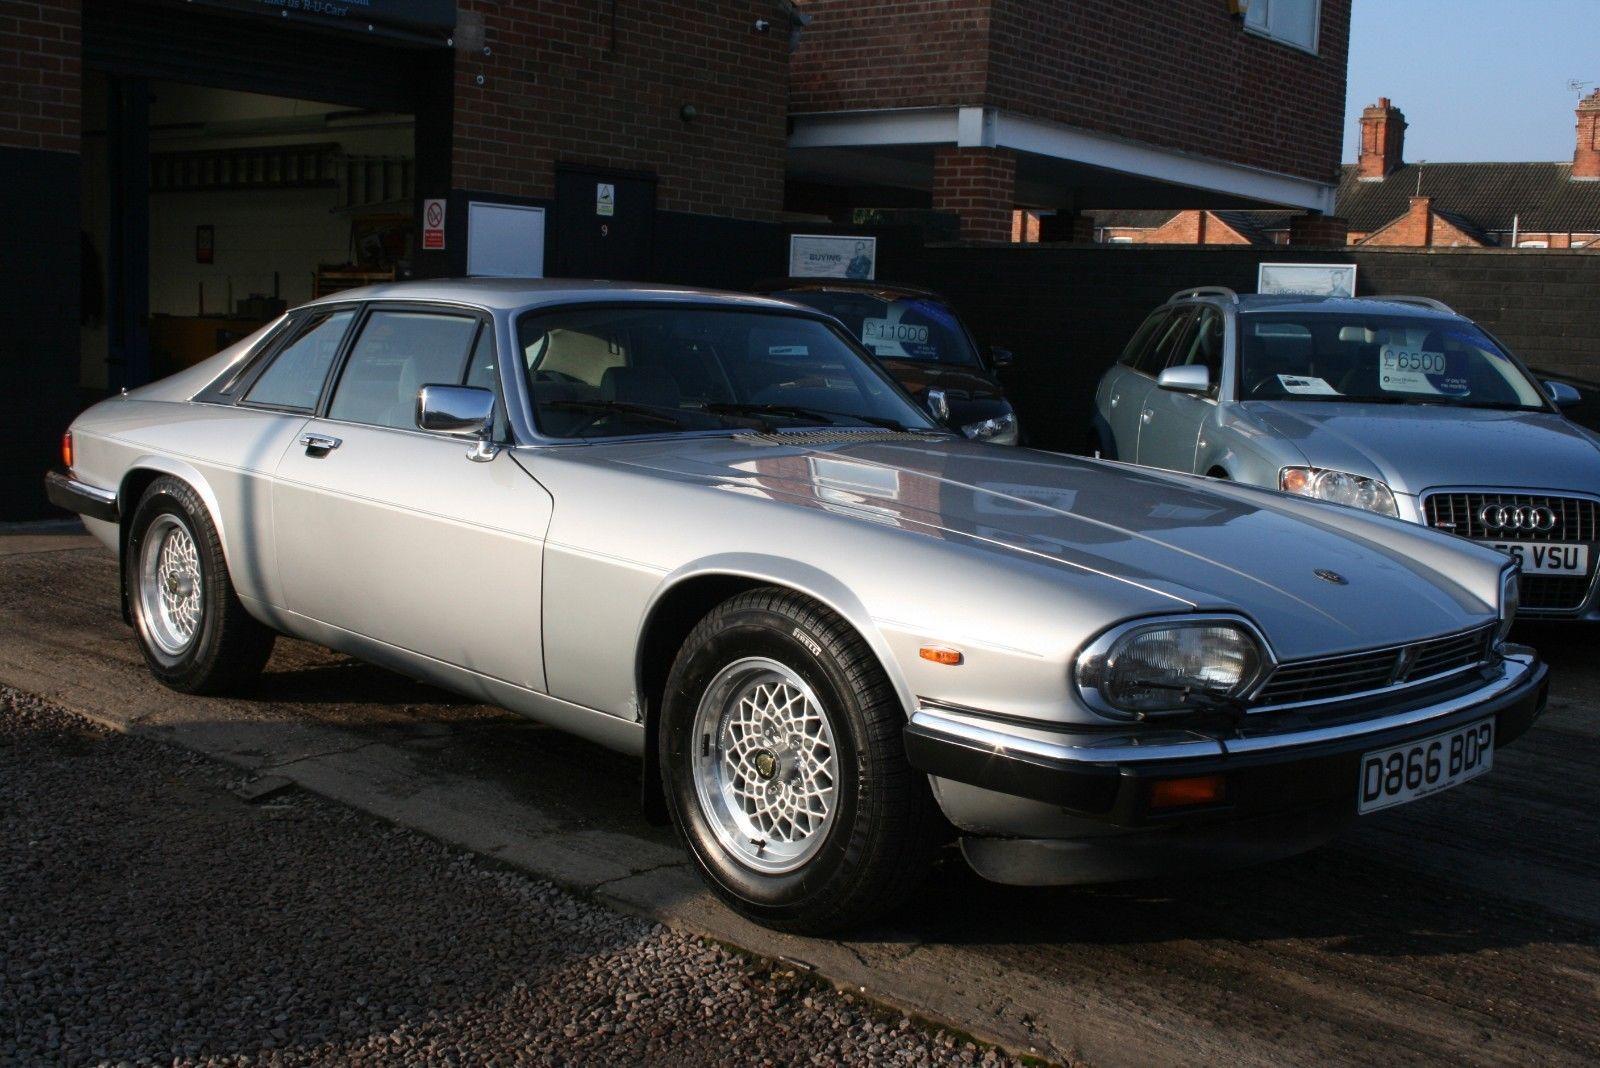 1987 Jaguar Xjs 5 3 V12 He Auto Automatic Xj S Easy Restoration Project Jaguar Auto Classic Cars